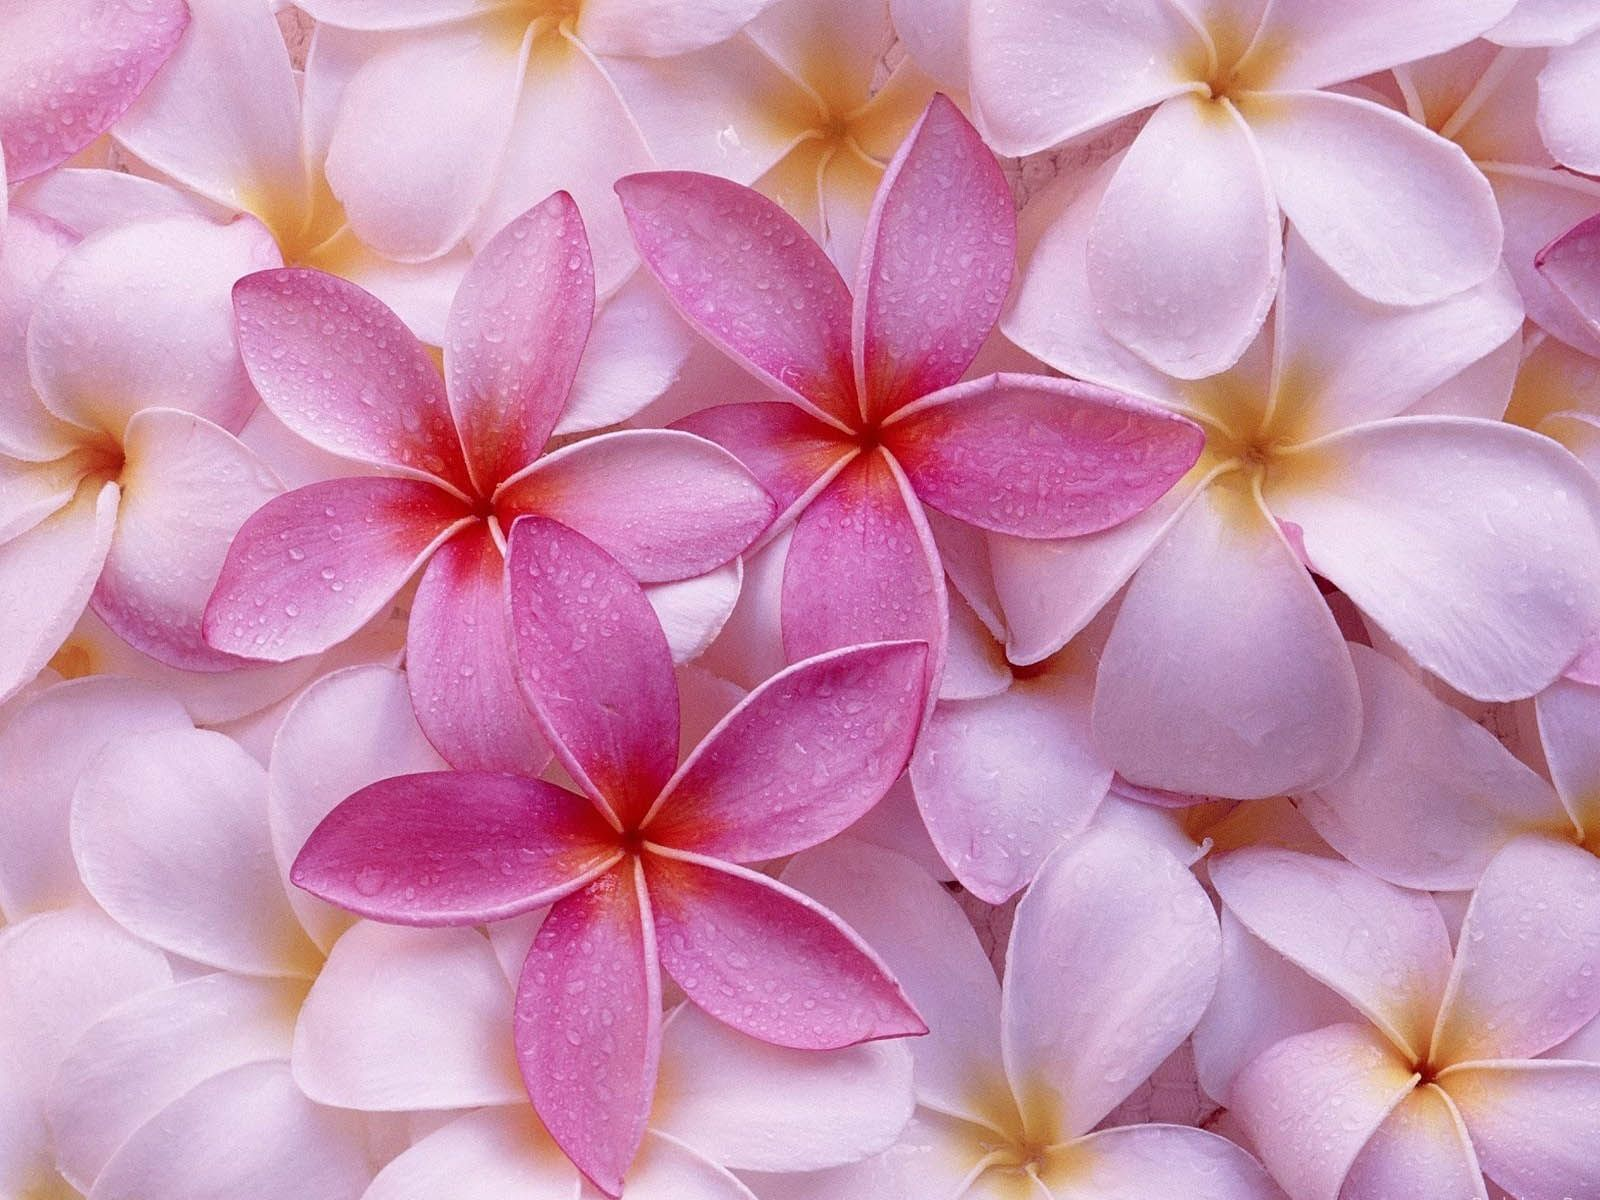 Gambar Bunga Kamboja Pink Design Pinterest